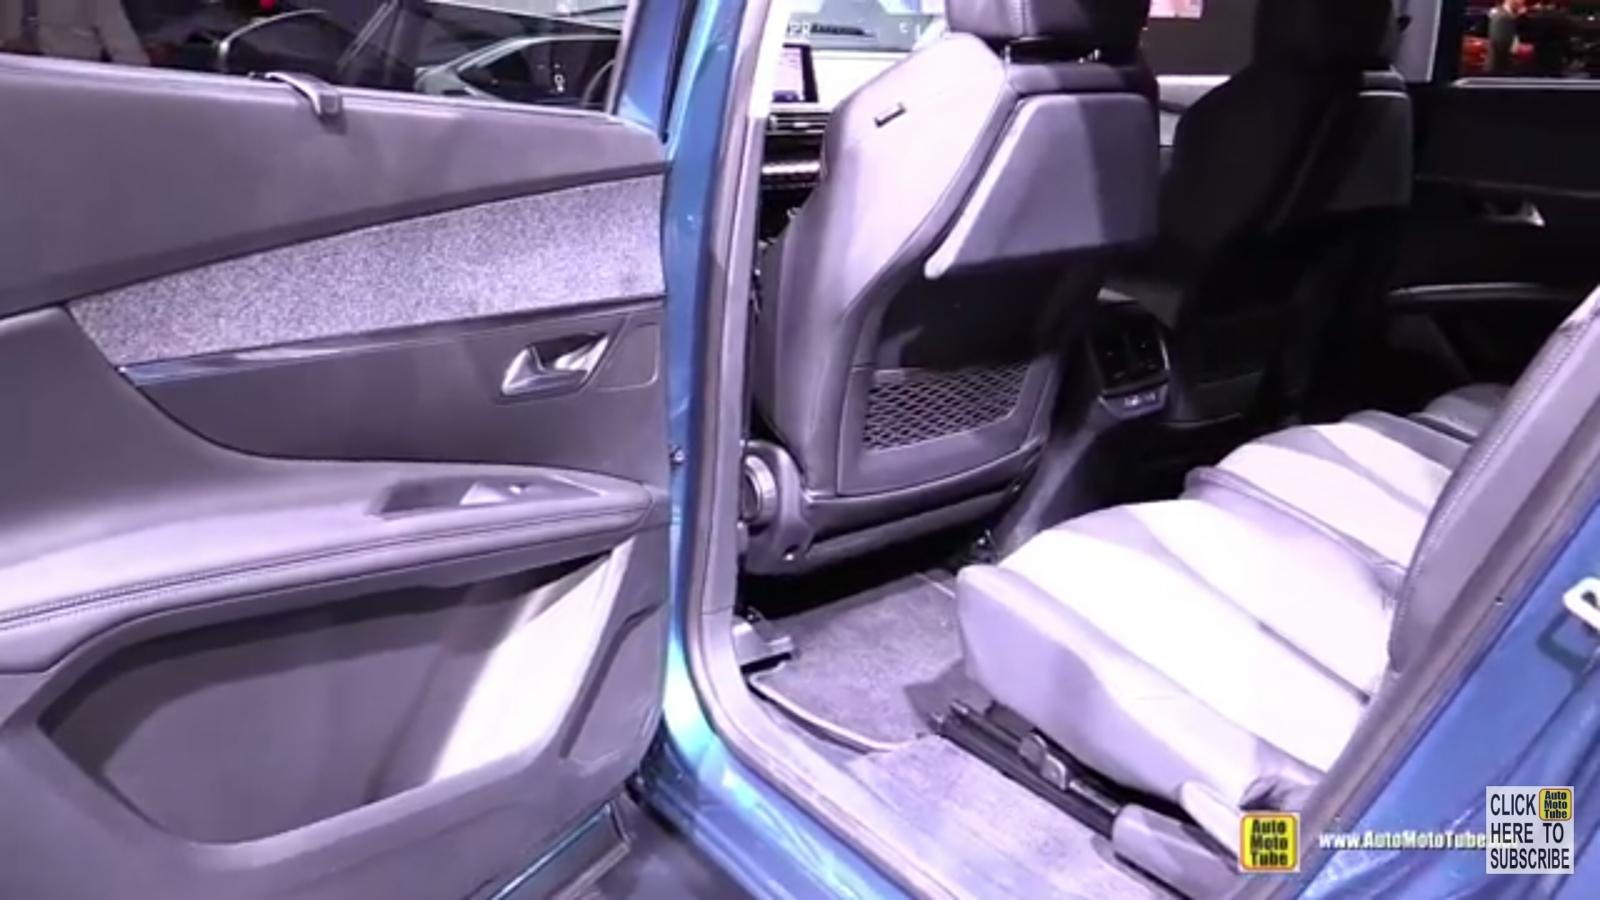 Mesitas plegables asientos delanteros 33fcm6t